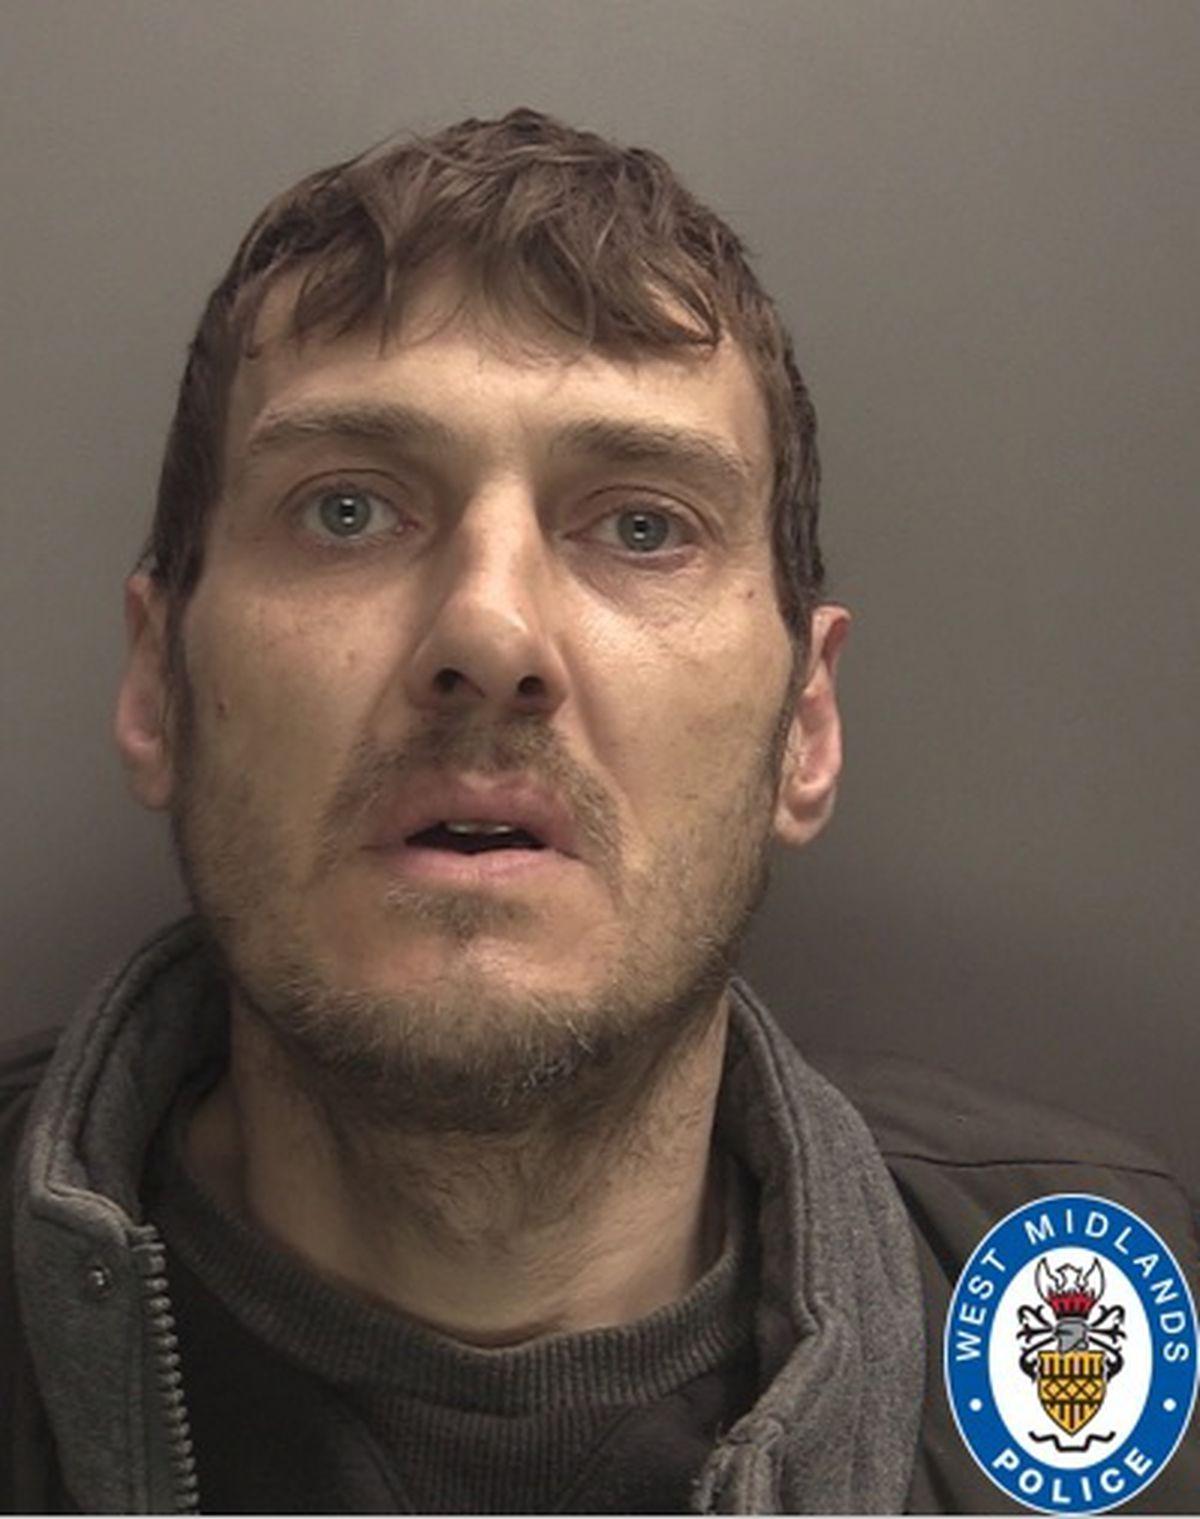 Simon Clarke has been jailed